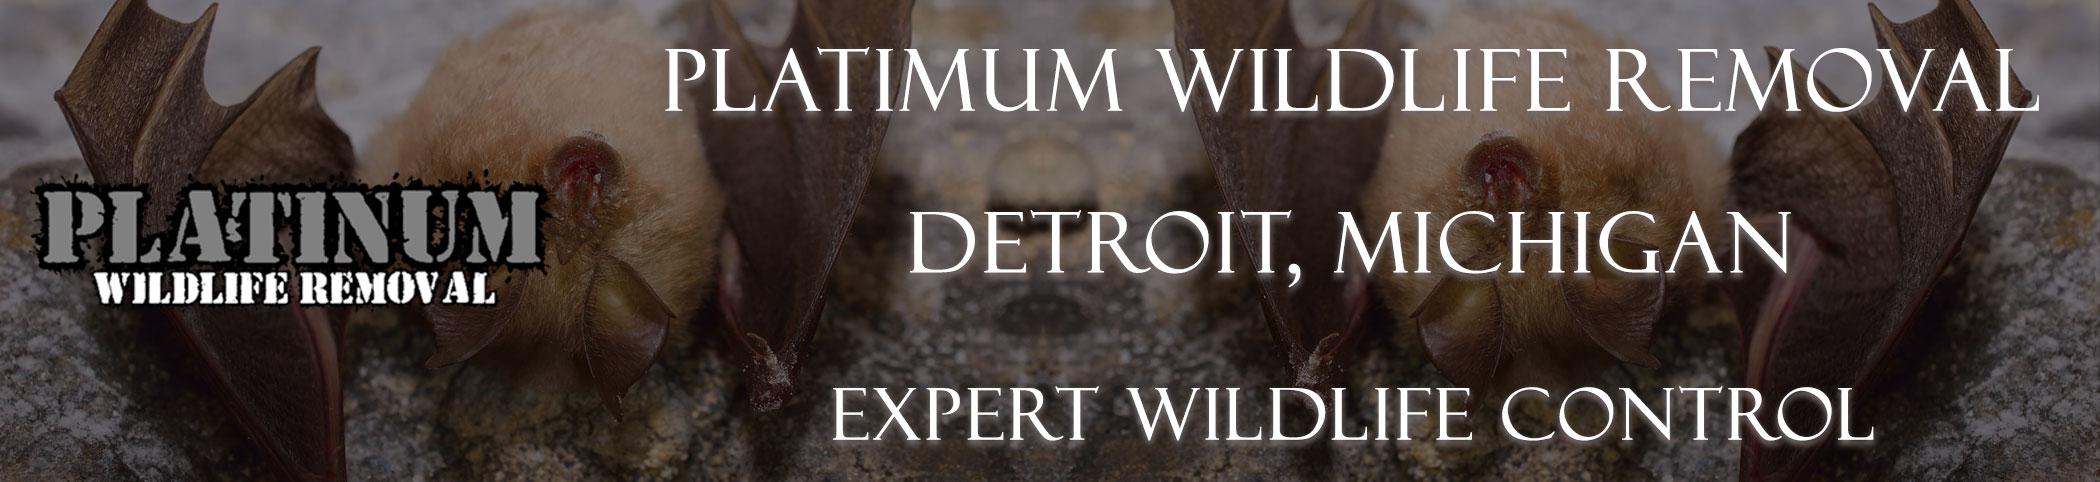 Detroit-Platinum-Wildlife-Removal-michgan